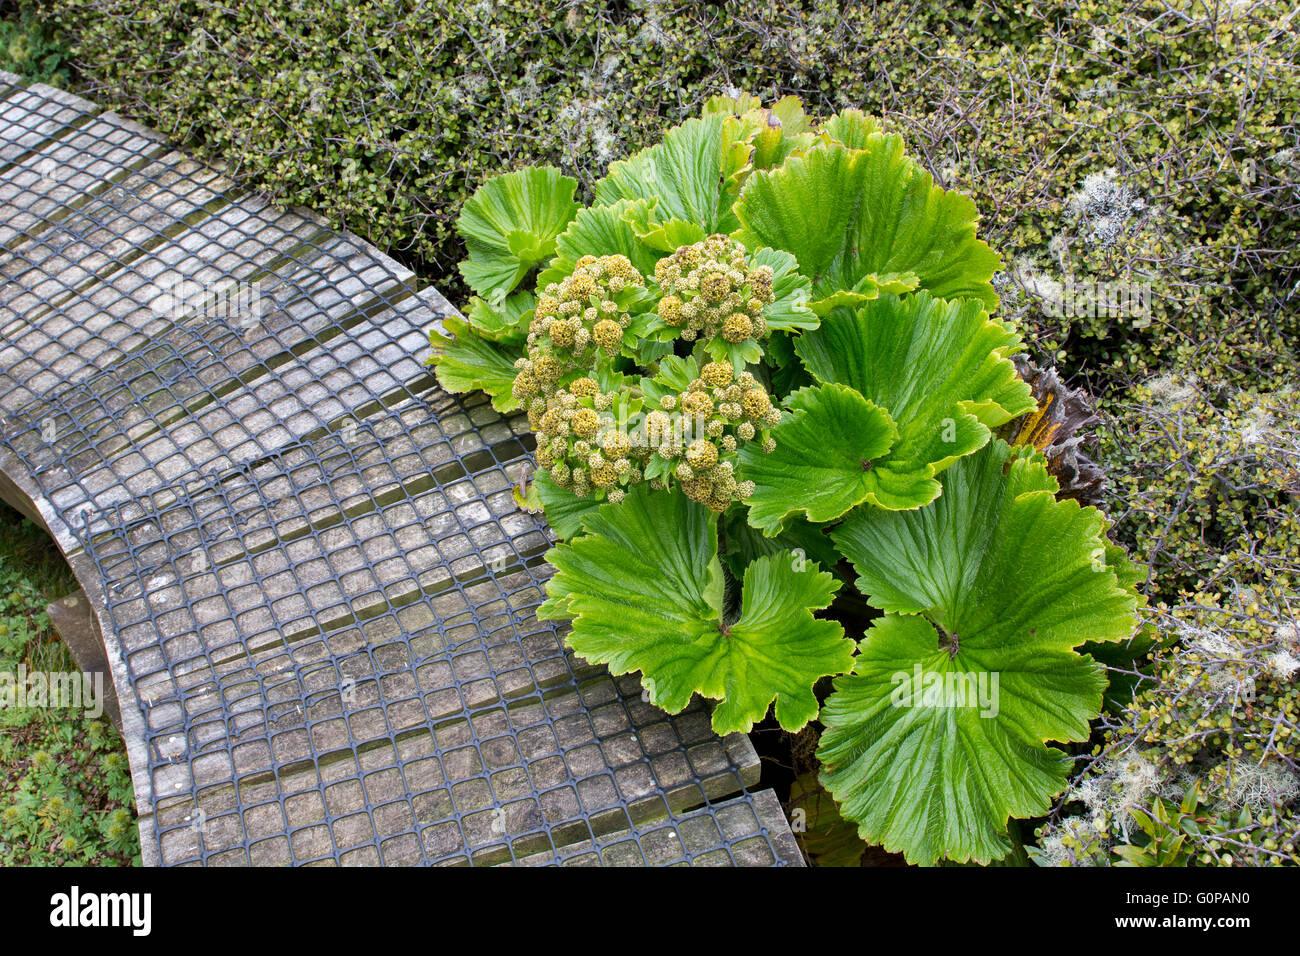 New Zealand, Auckland Islands, Enderby Island. Endemic megaherb, Stilbocarpa polaris. Stock Photo